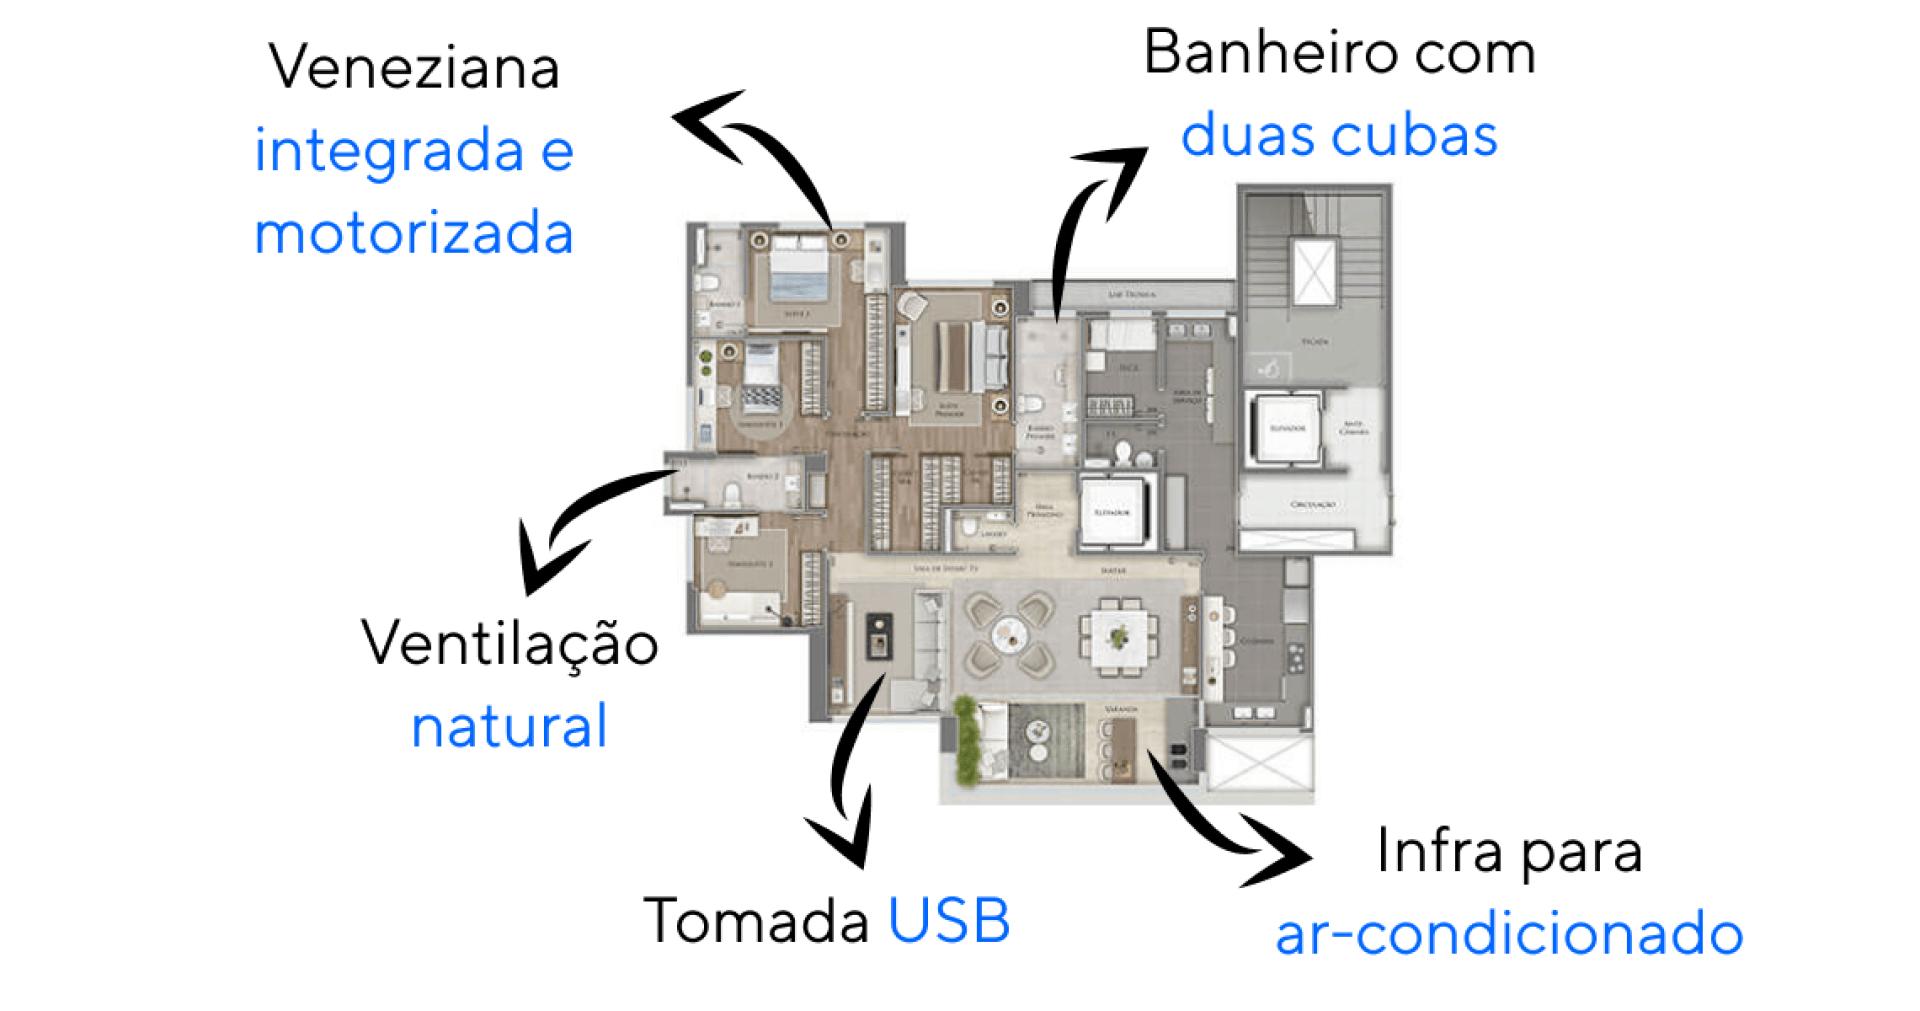 Planta do Duo. floorplan